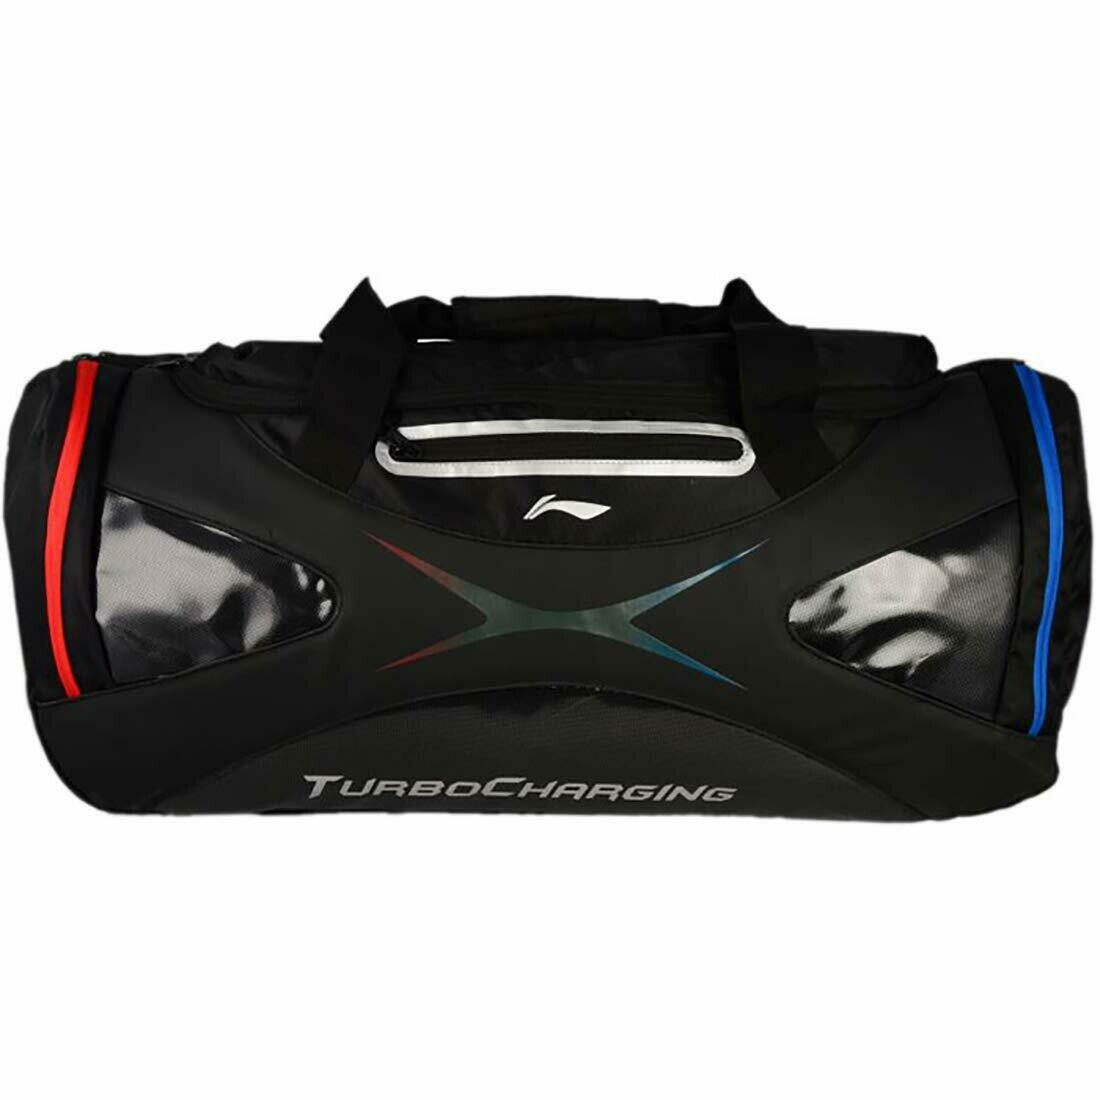 LI-NING ABDC002-1 9 in 1 Kit Bag Black